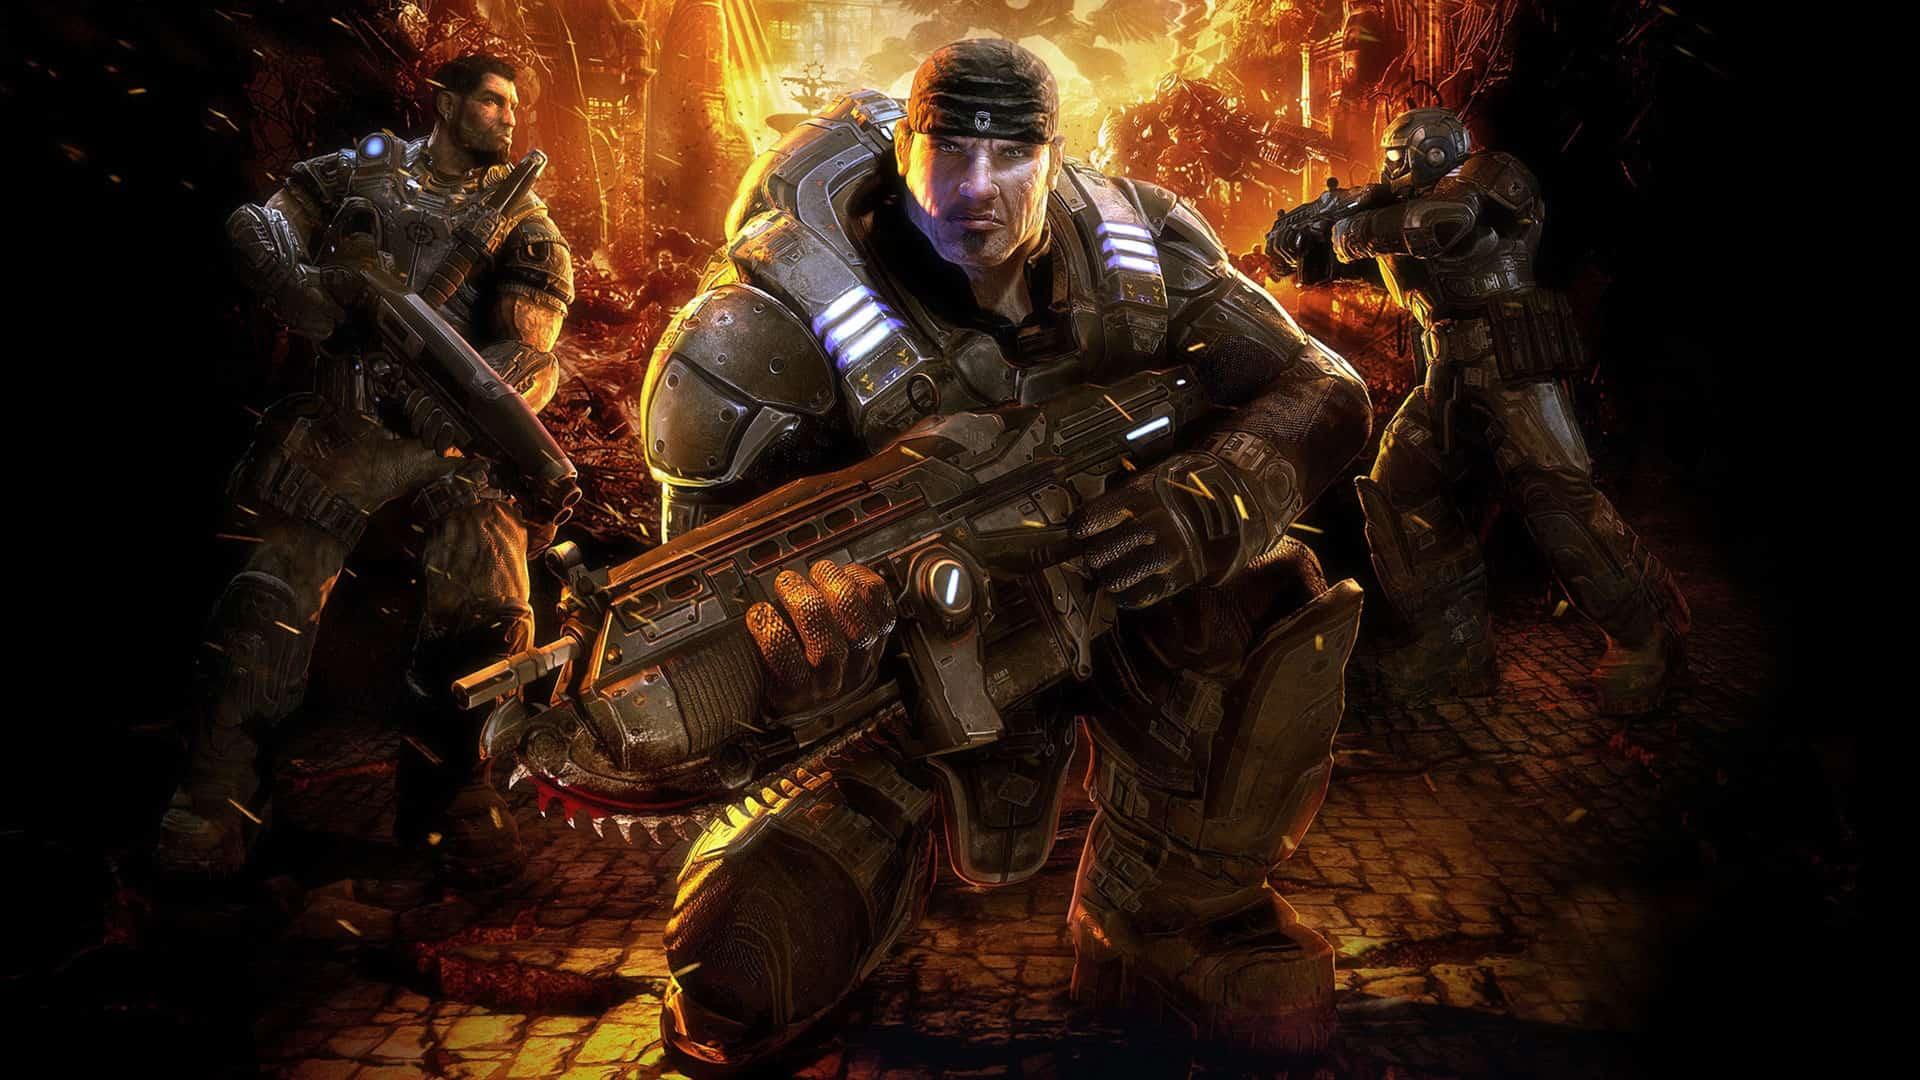 gears_of_war_wallpaper